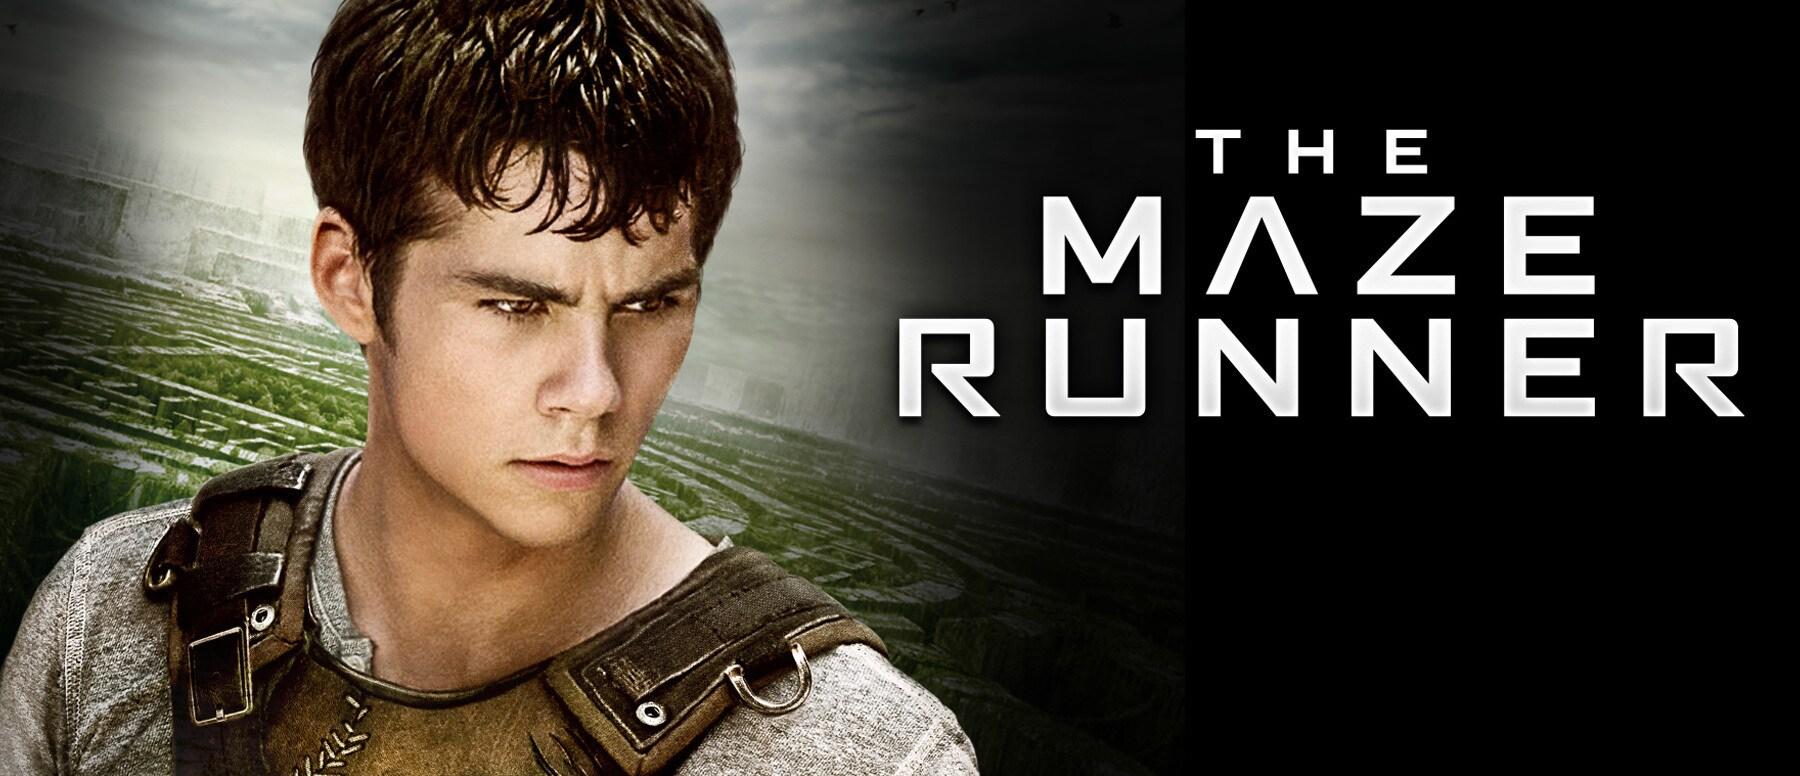 The Maze Runner Hero